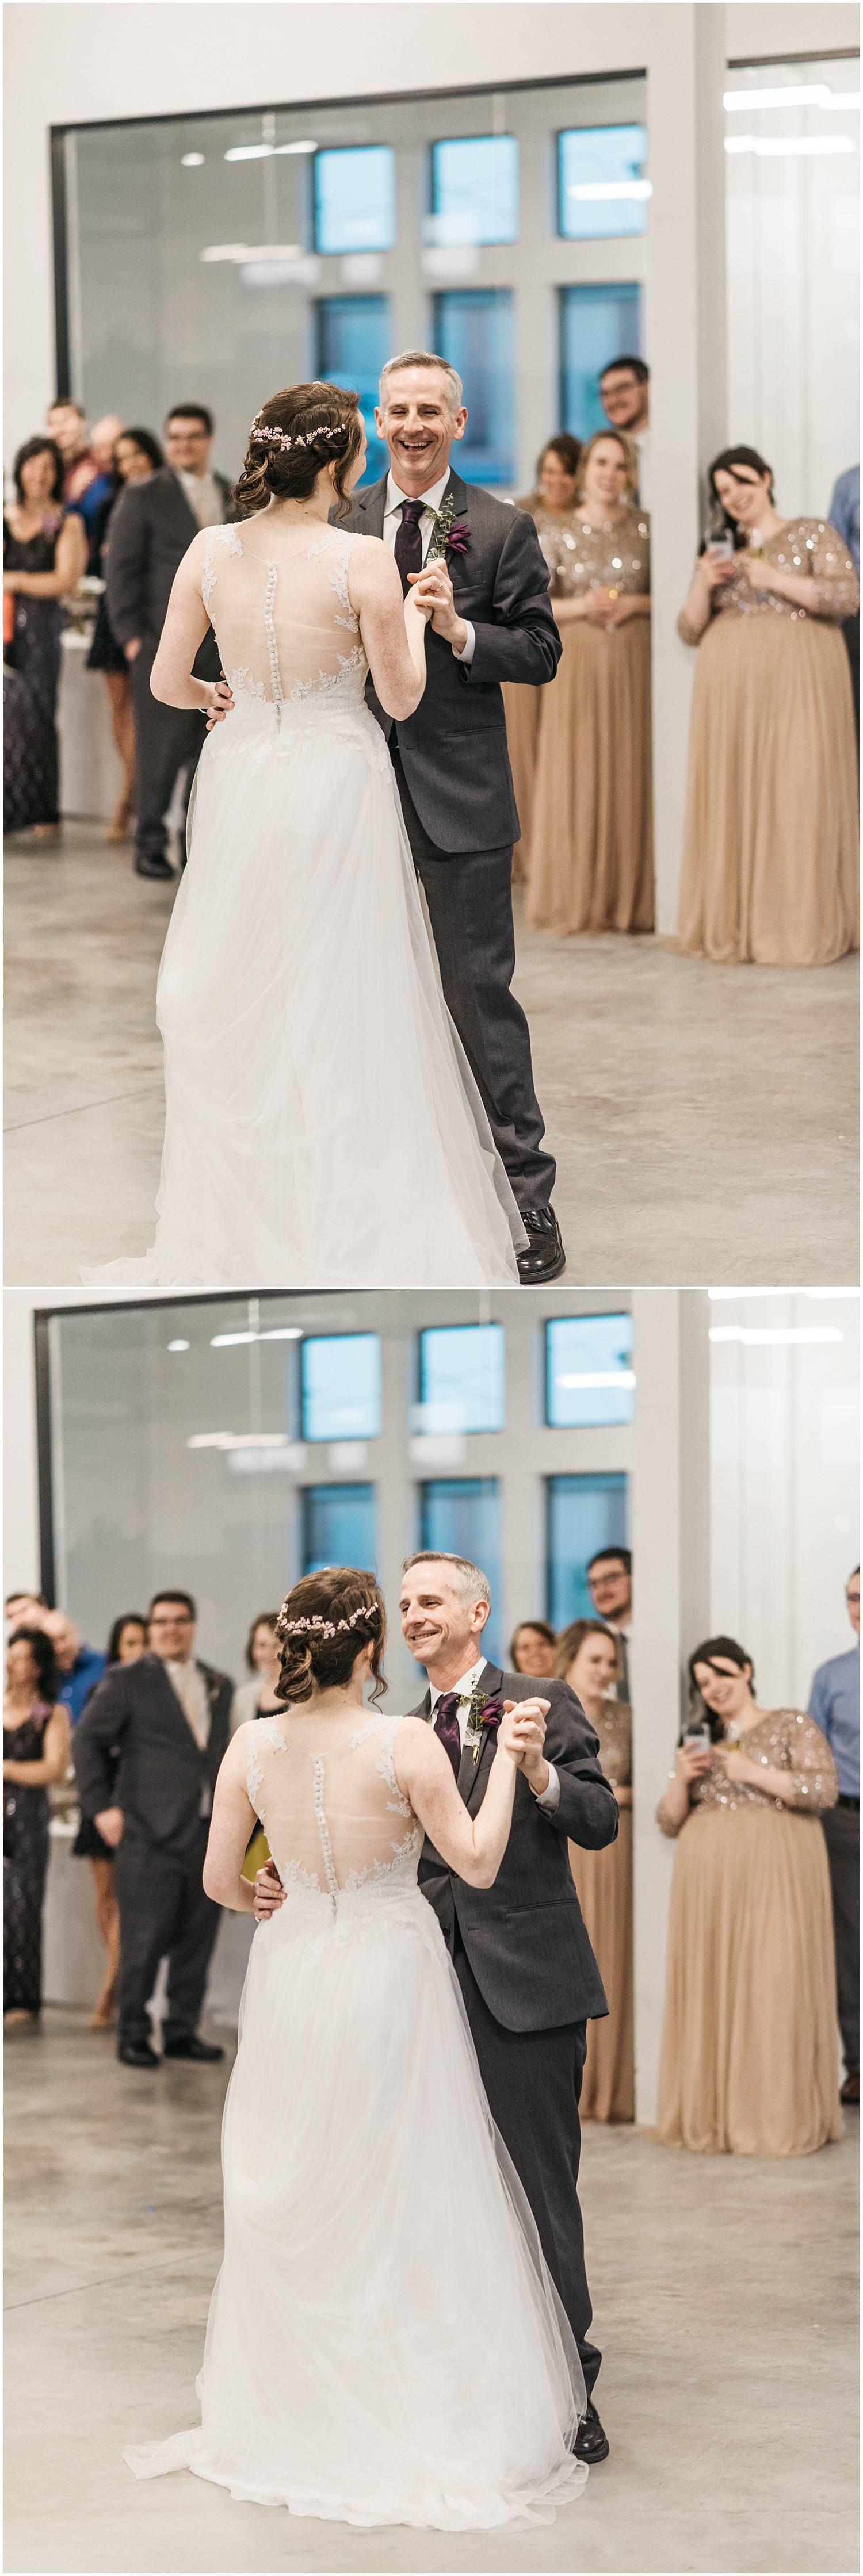 Josh - Emily - wedding - supply manheim- www.gabemcmullen.com111.jpg